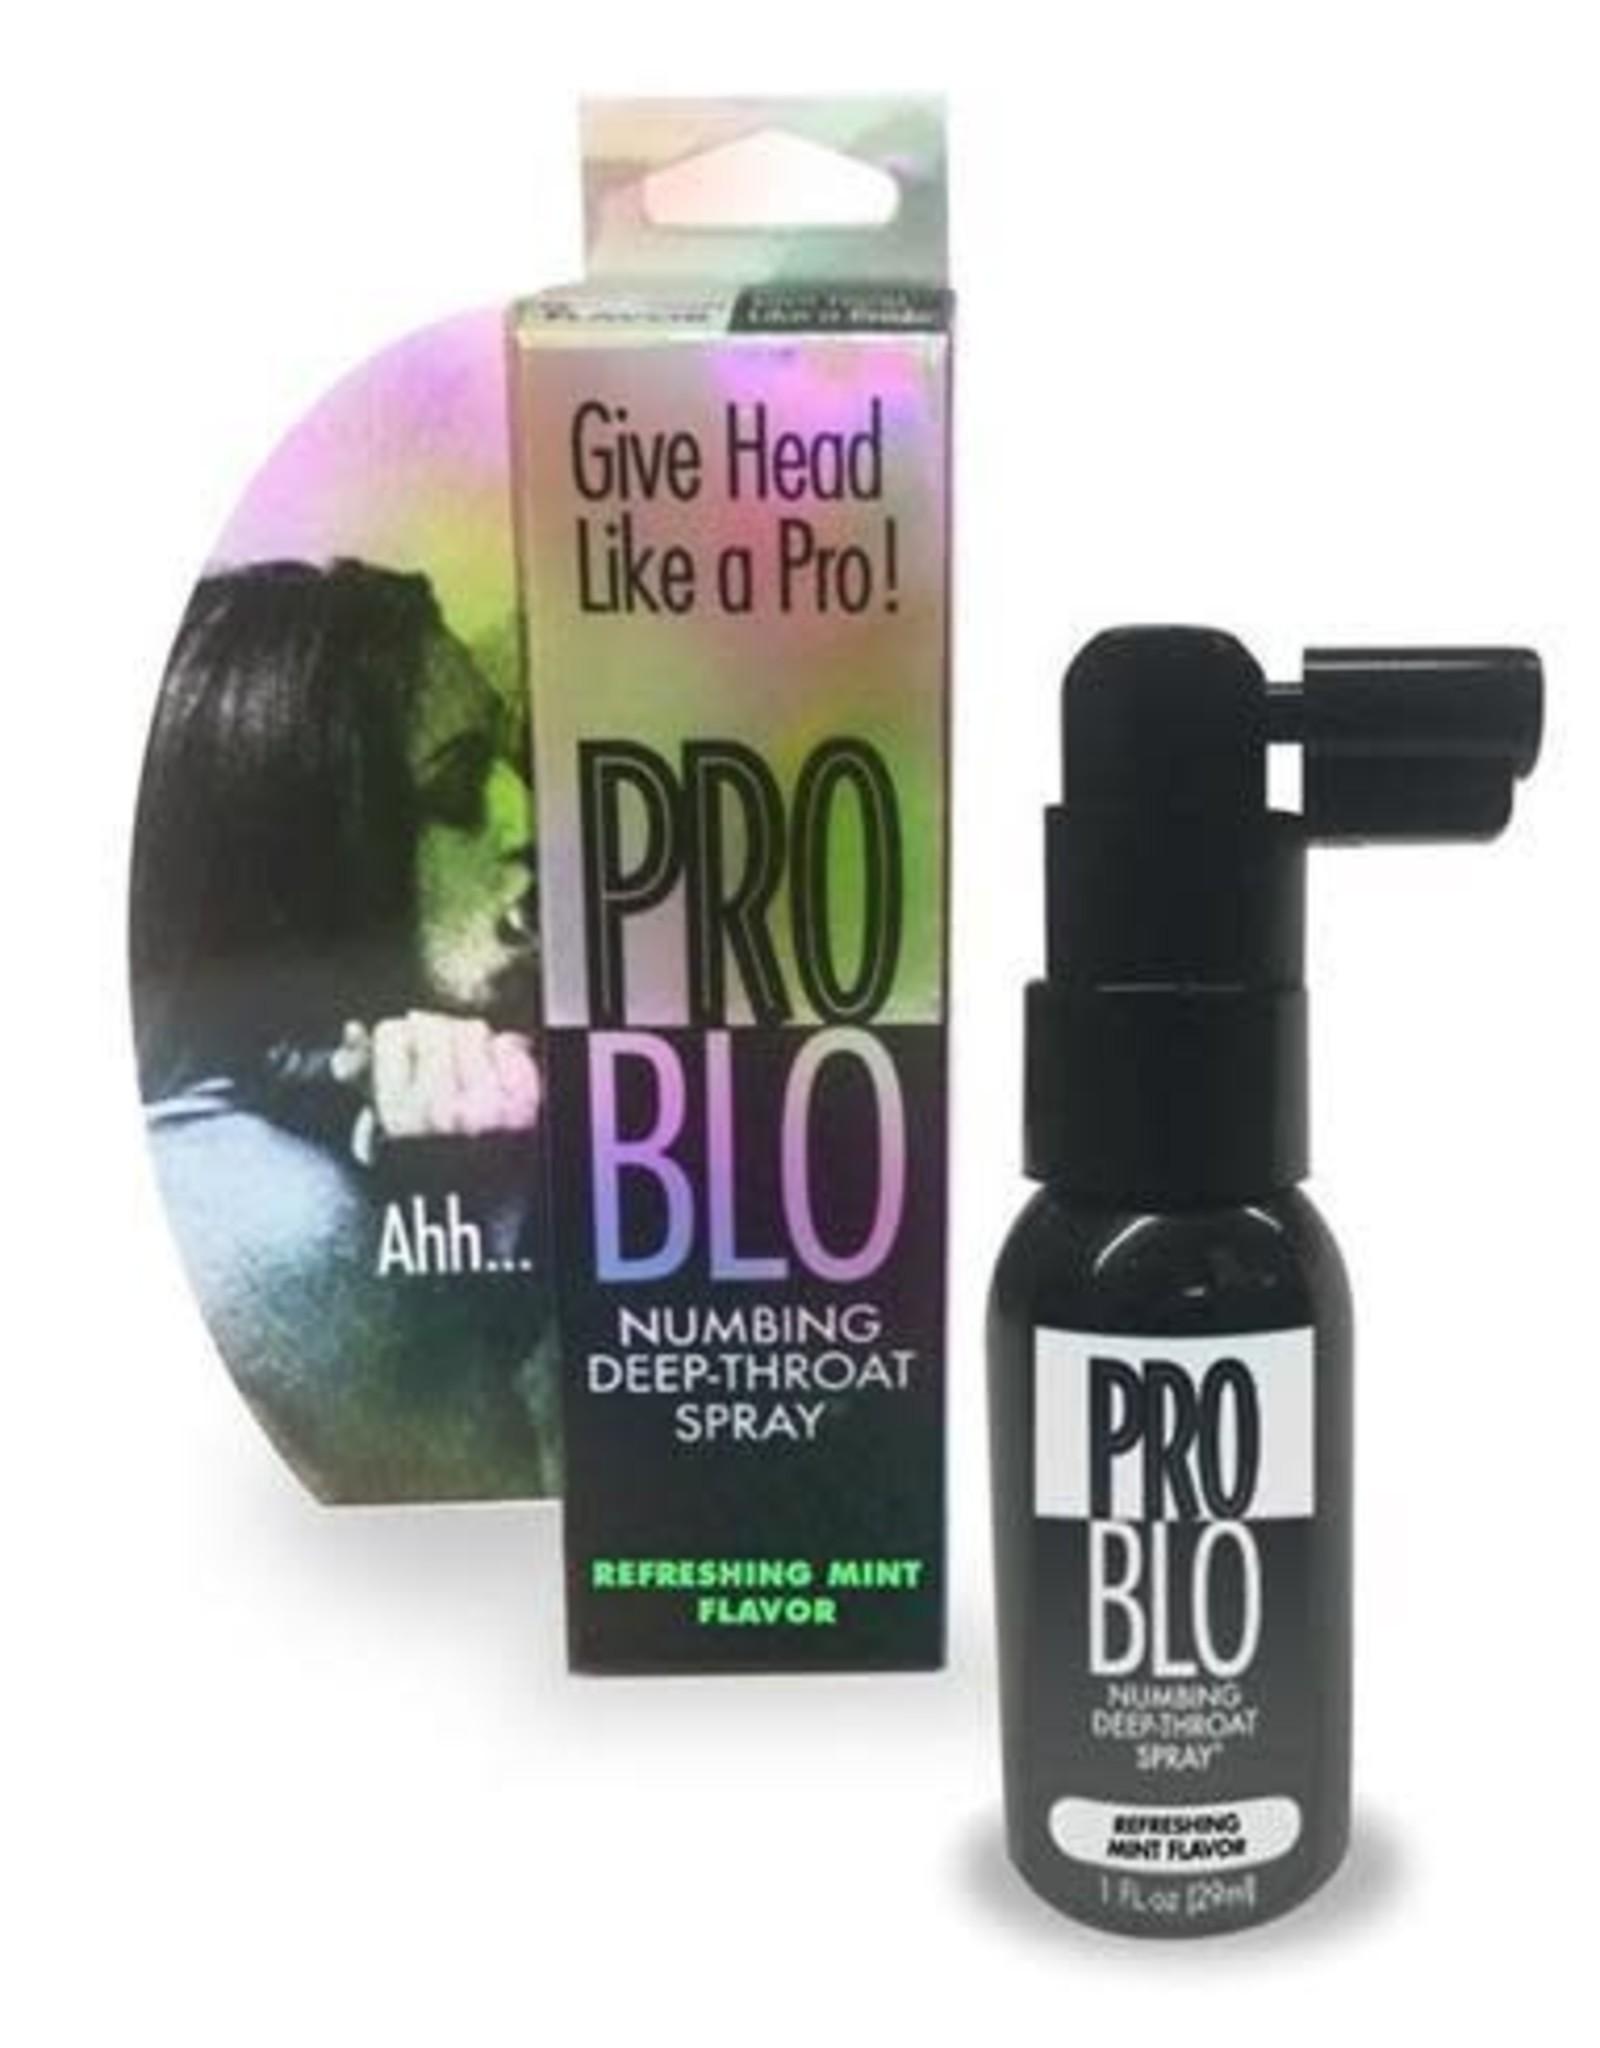 Little Genie ProBlo - Numbing Deep Throat Spray - Mint - 1 oz